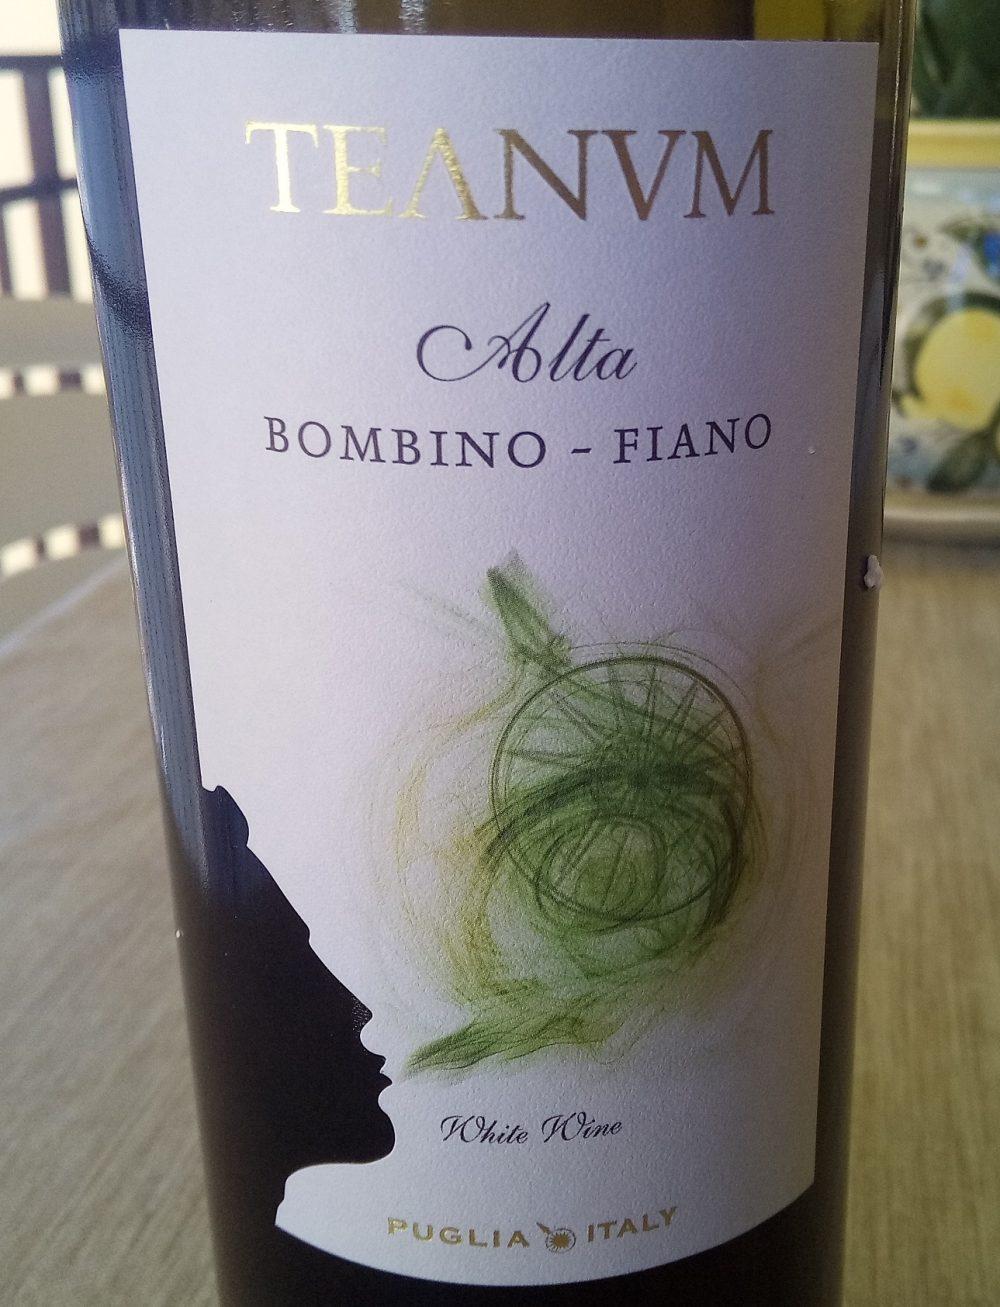 Alta Bombino Fiano Puglia Igp 2016 Teanum